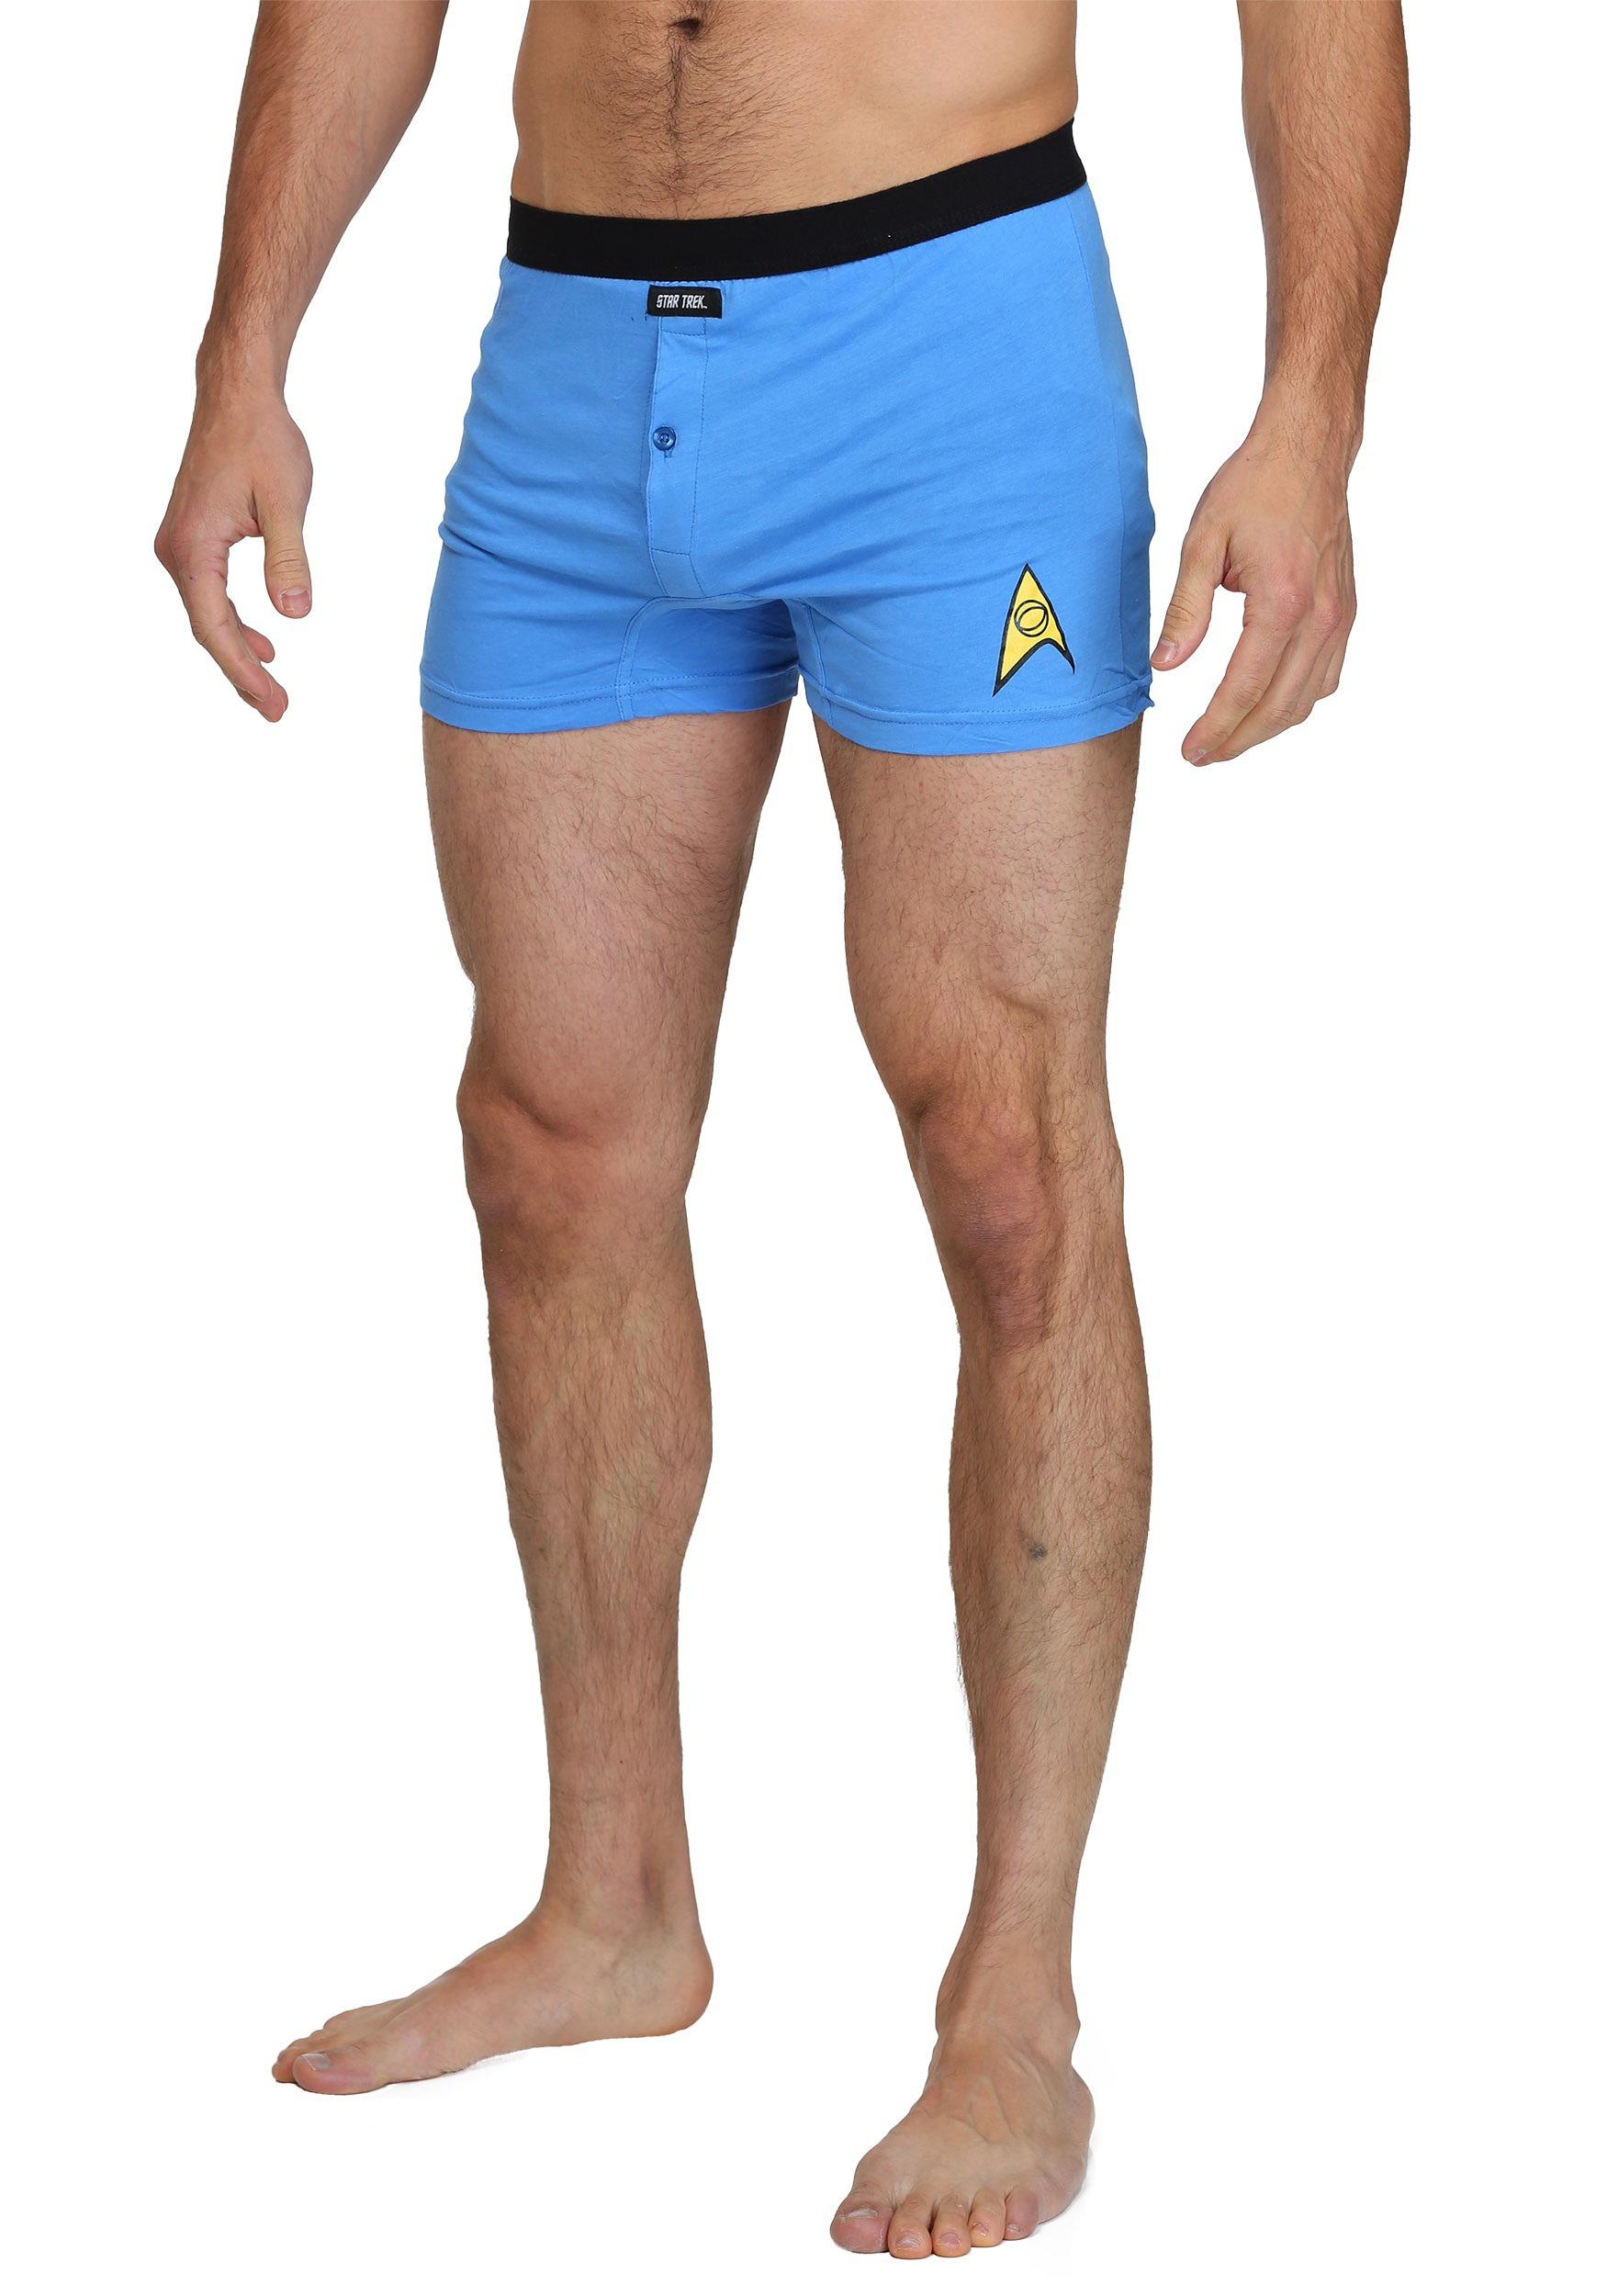 6275a350a0 Star Trek Men s Boxers 3 Pack2